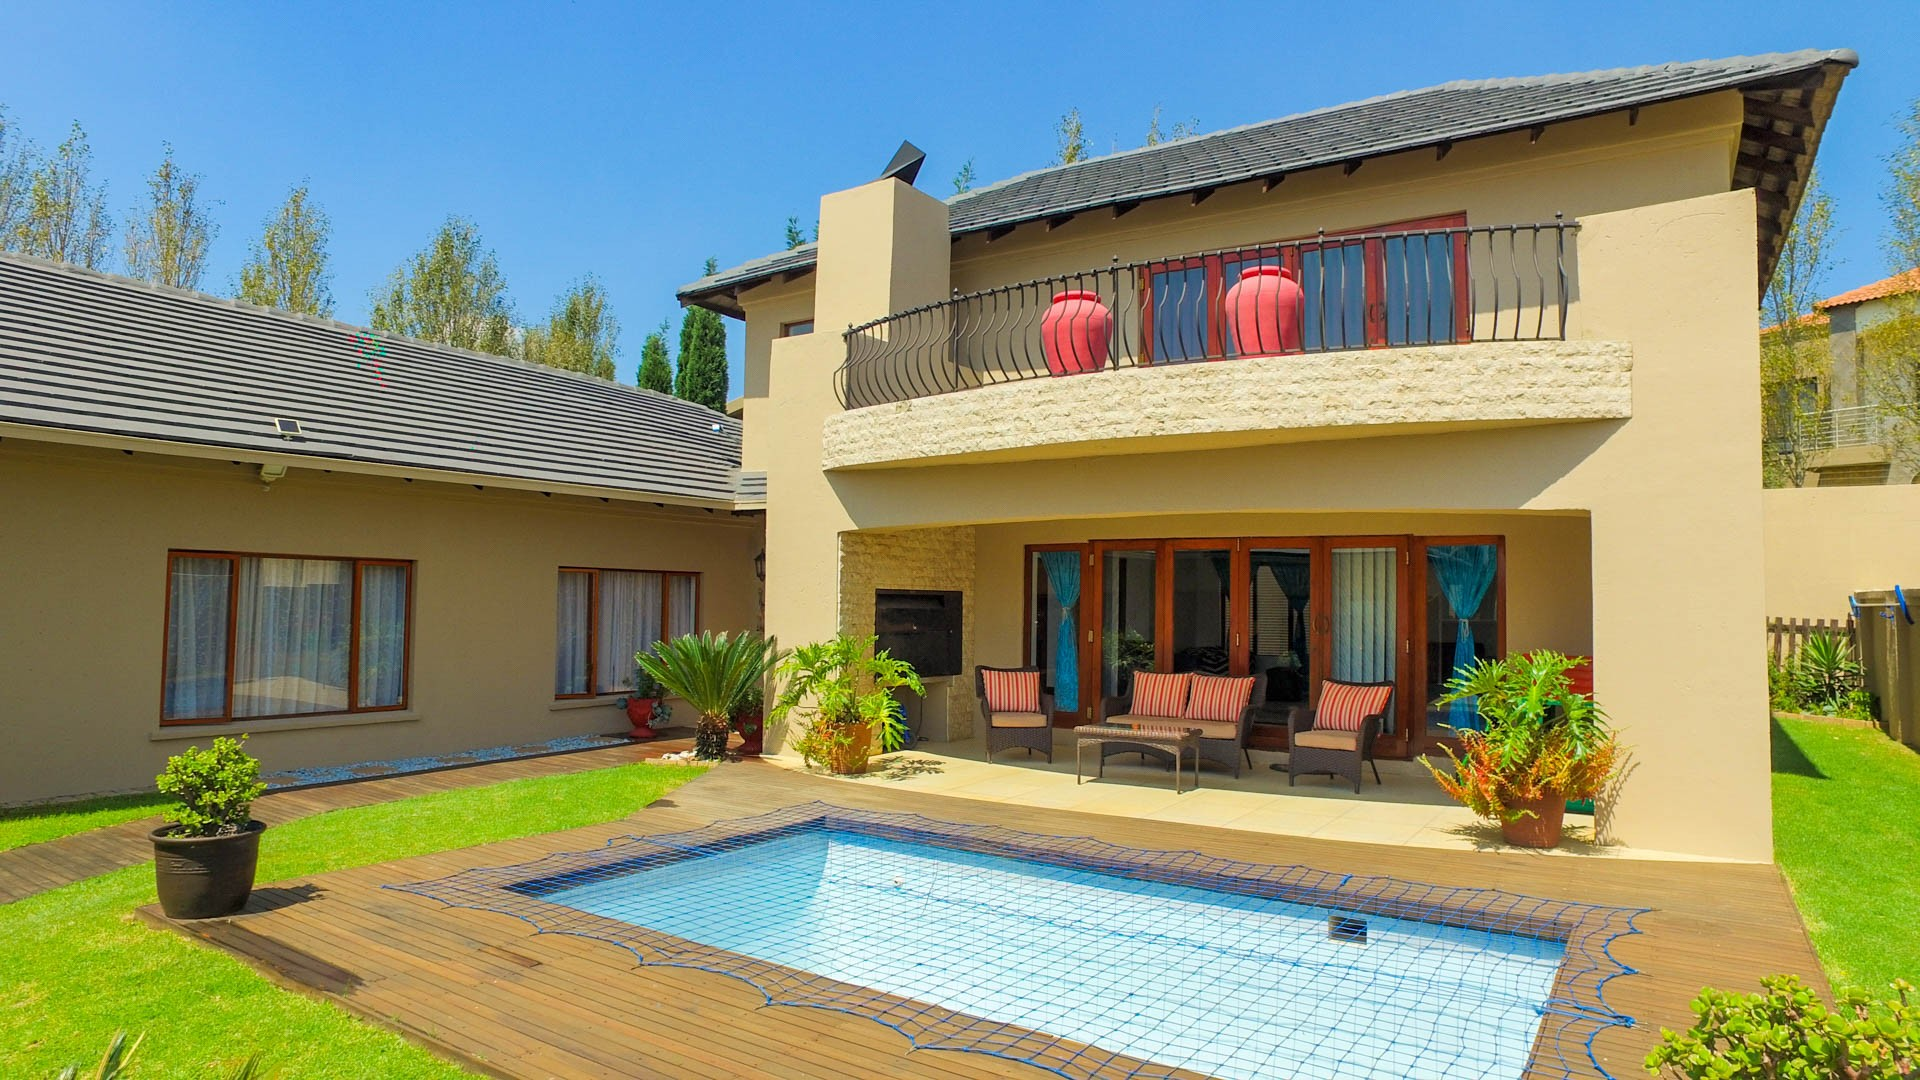 3 BedroomHouse For Sale In La Como Lifestyle Estate